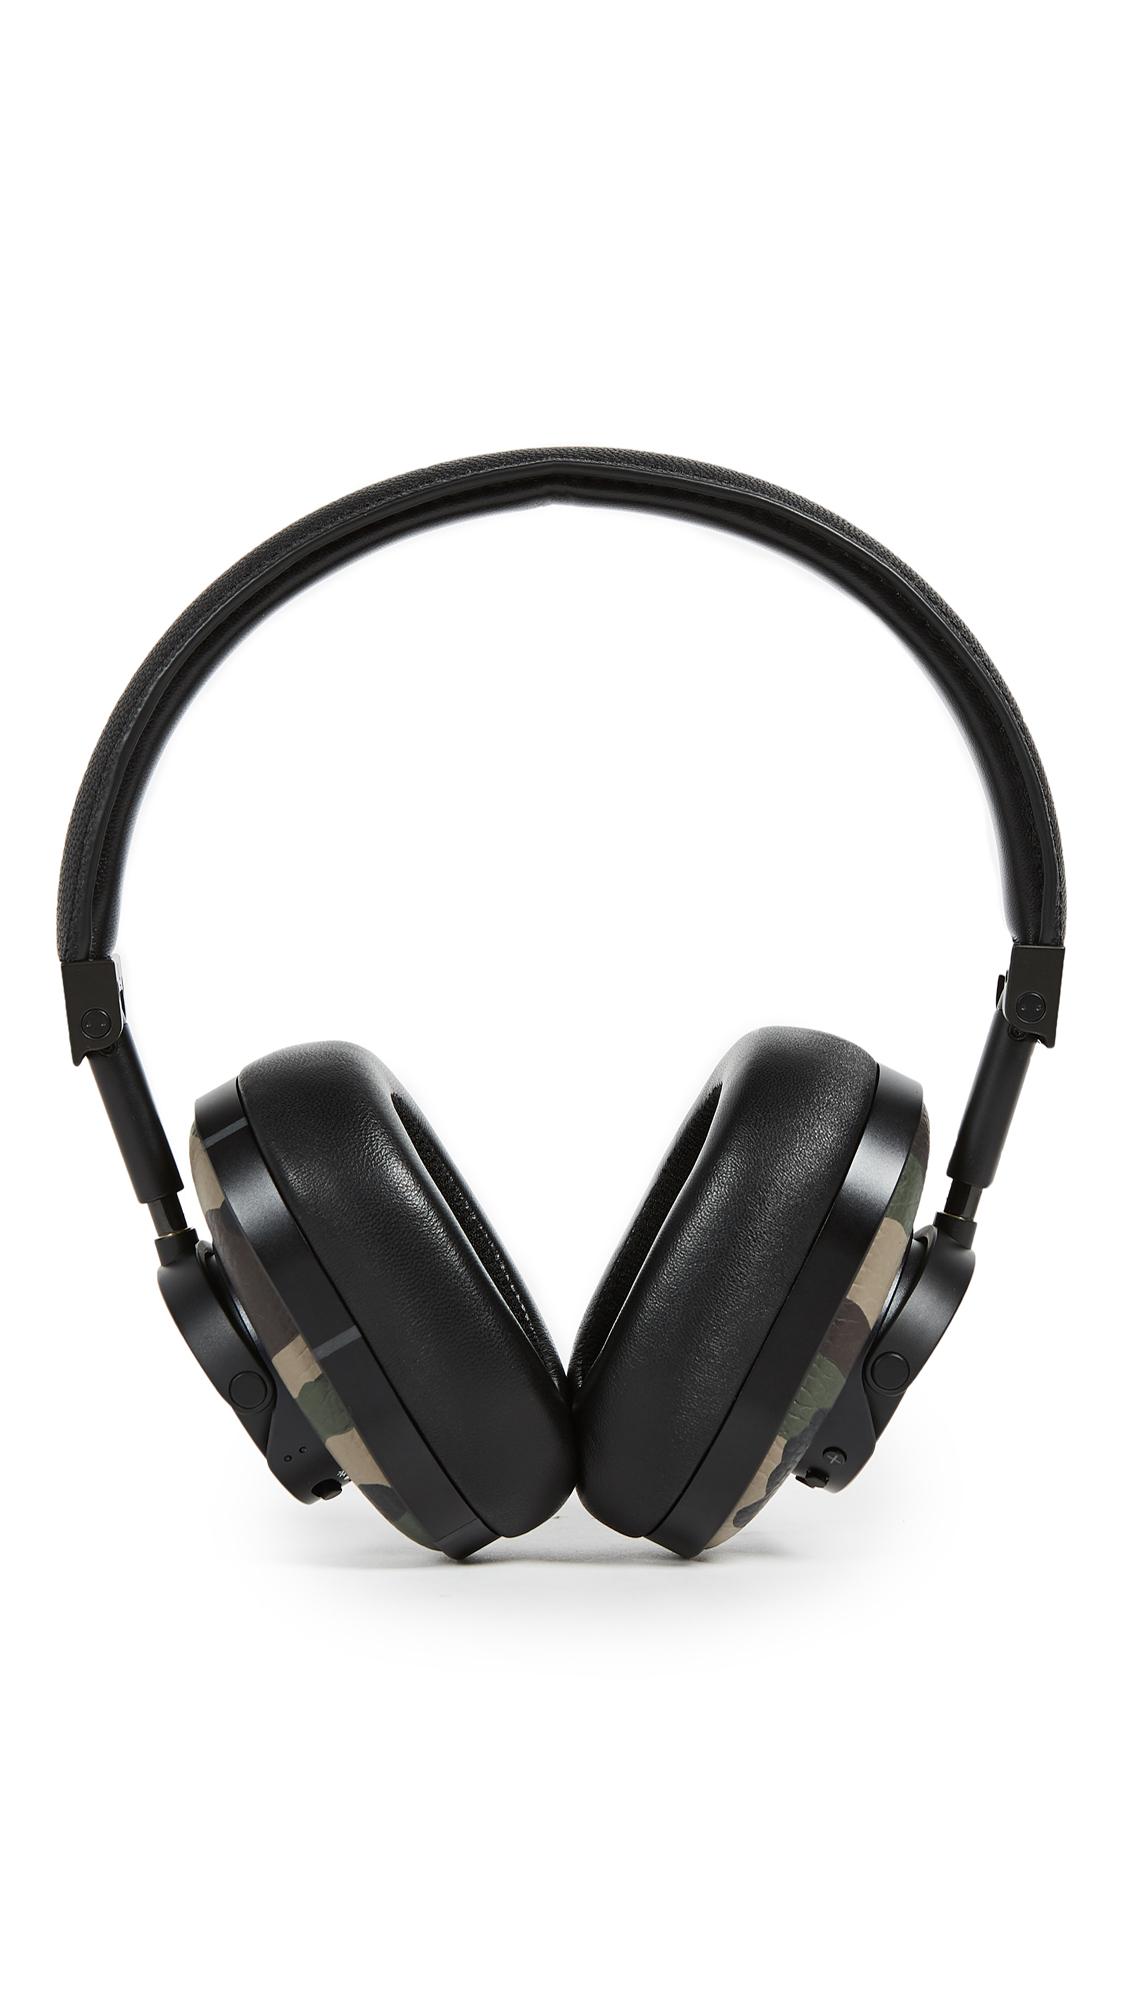 1f4b0001f5e Master & Dynamic MW60 Wireless Over Ear Headphones | EAST DANE